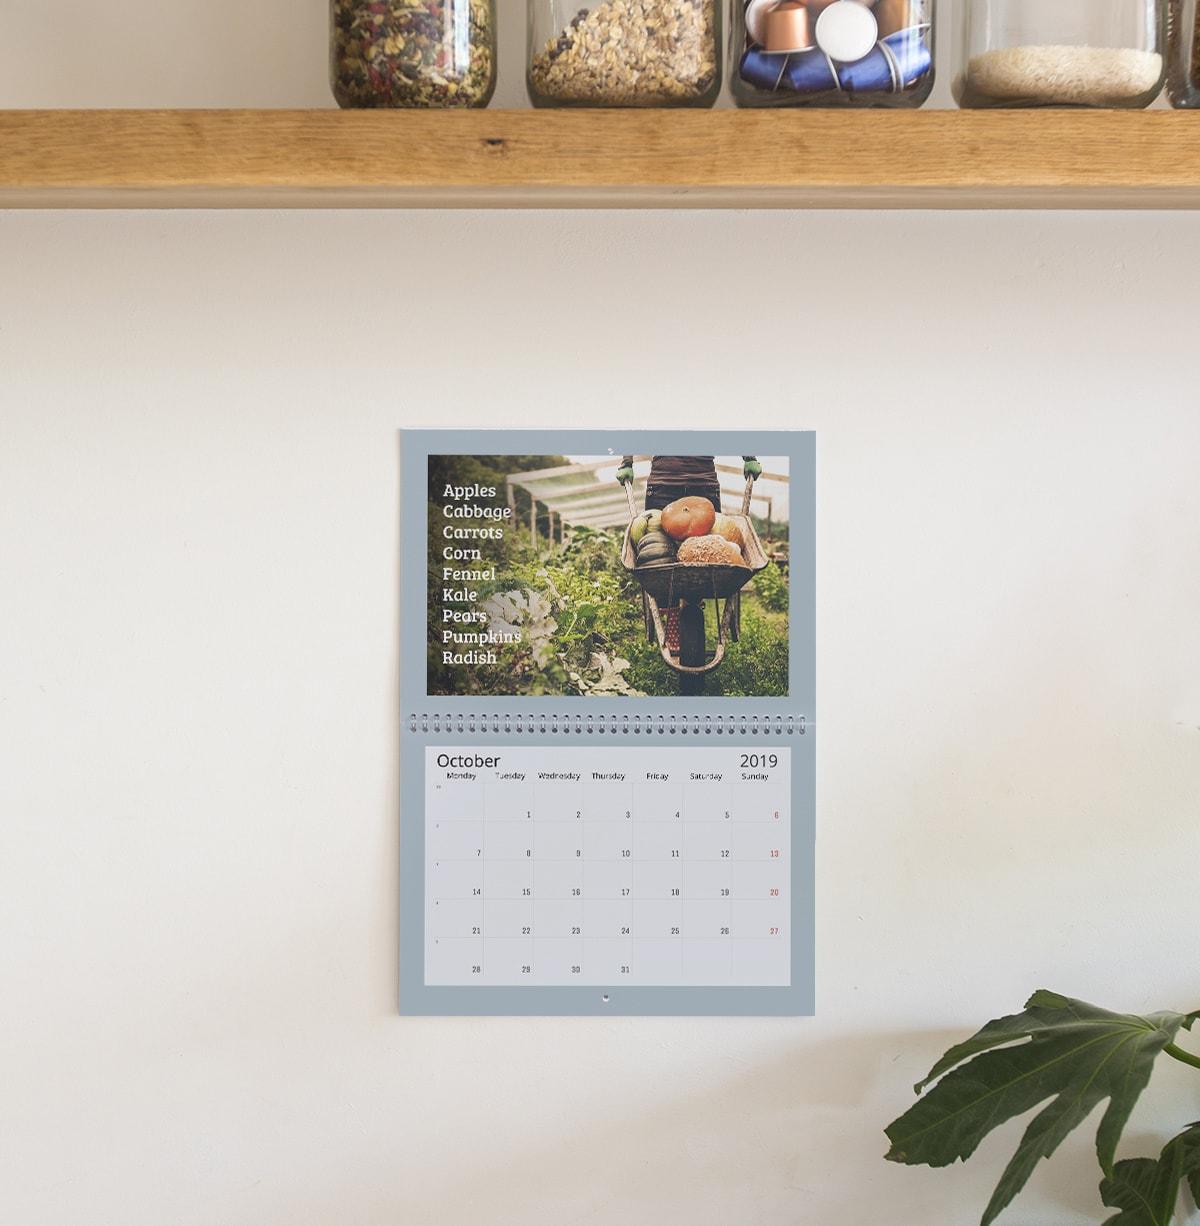 7 kreative fotokalender ideen f r pers nliche fotogeschenke. Black Bedroom Furniture Sets. Home Design Ideas